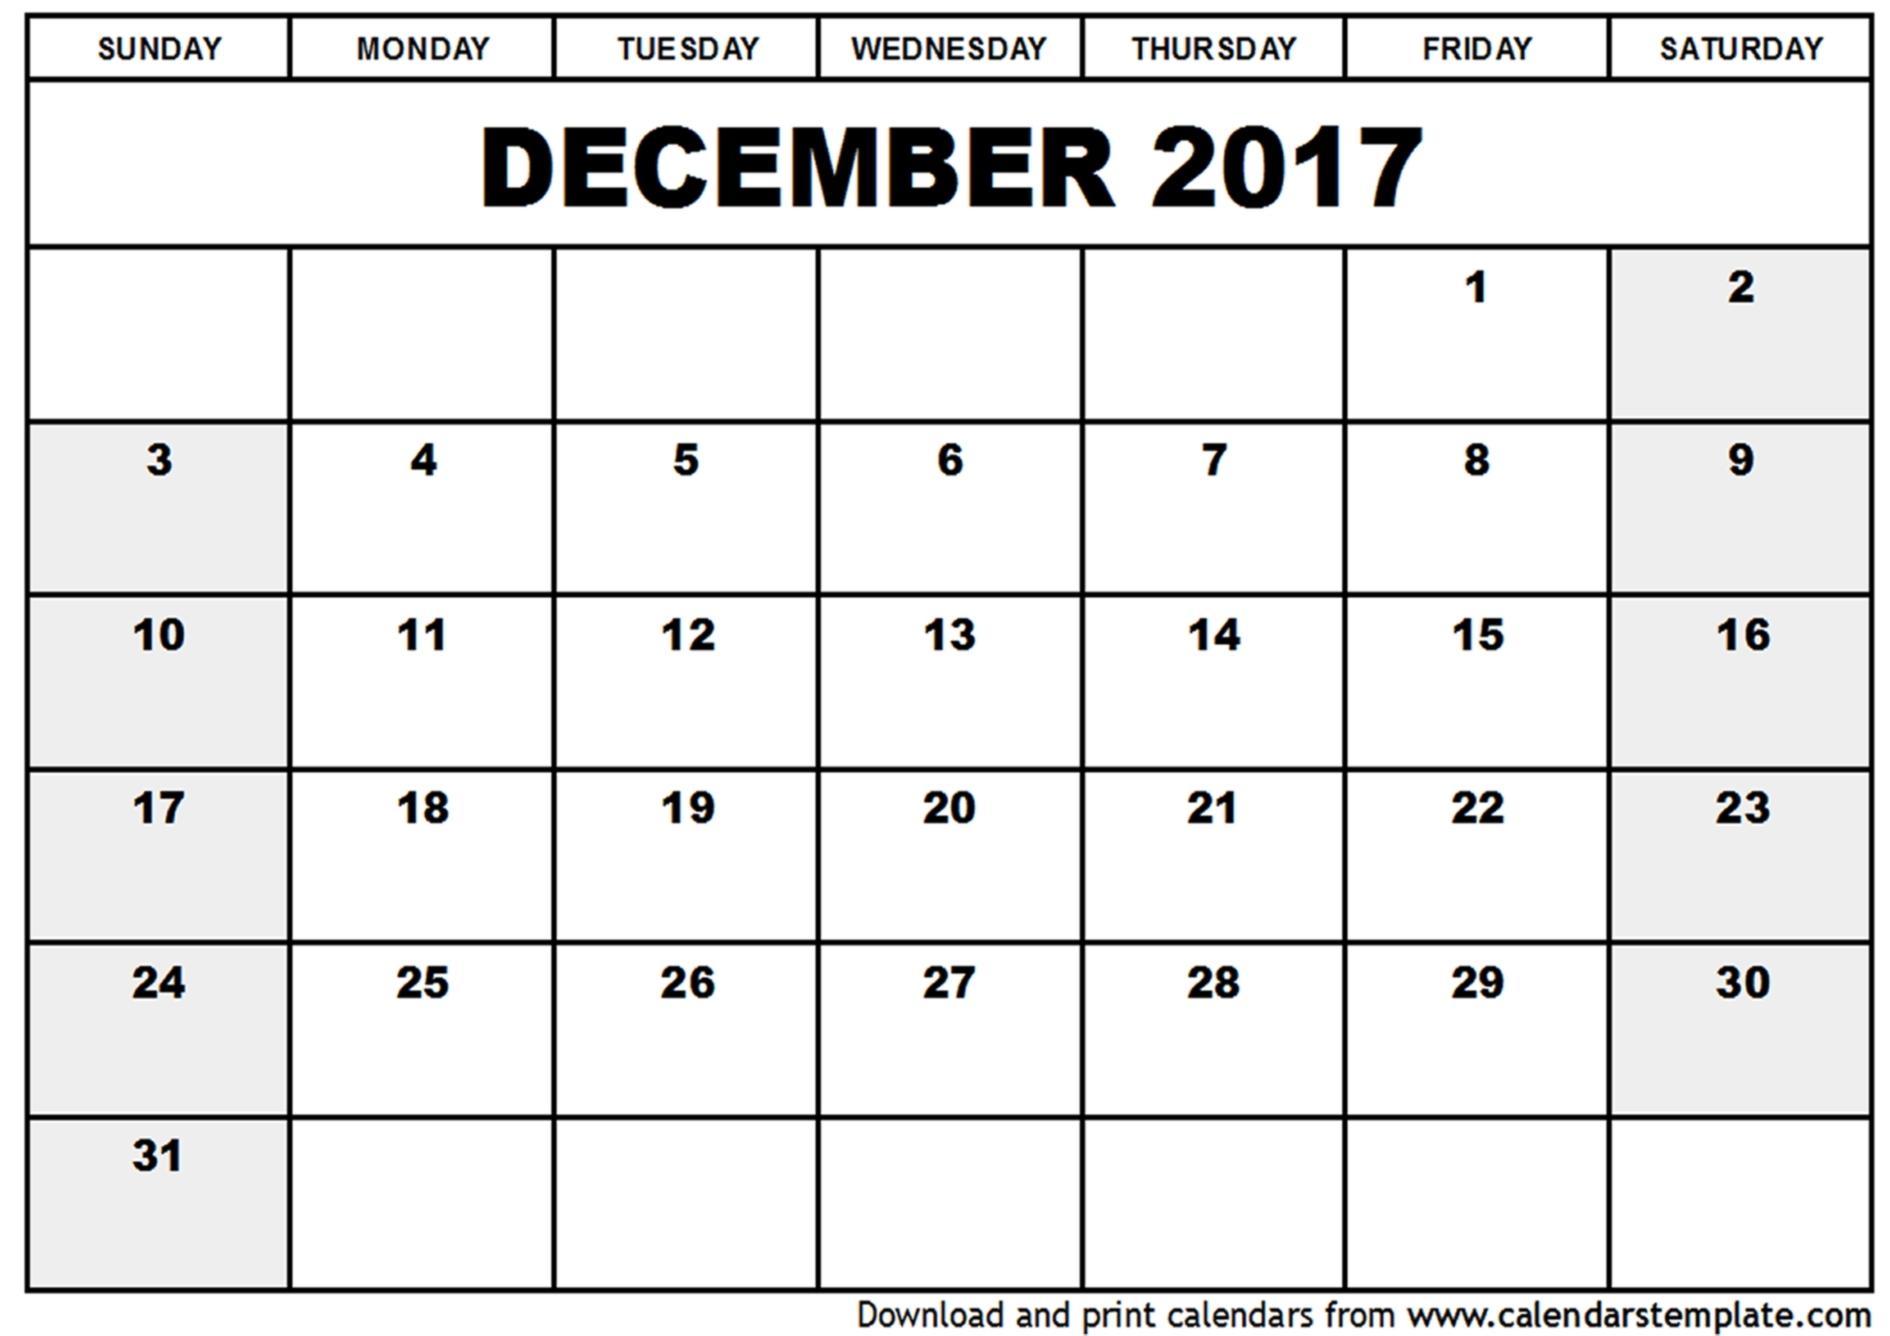 December 2017 Template Calendar – Template World with Nov Dec 2017 Calendar Printable